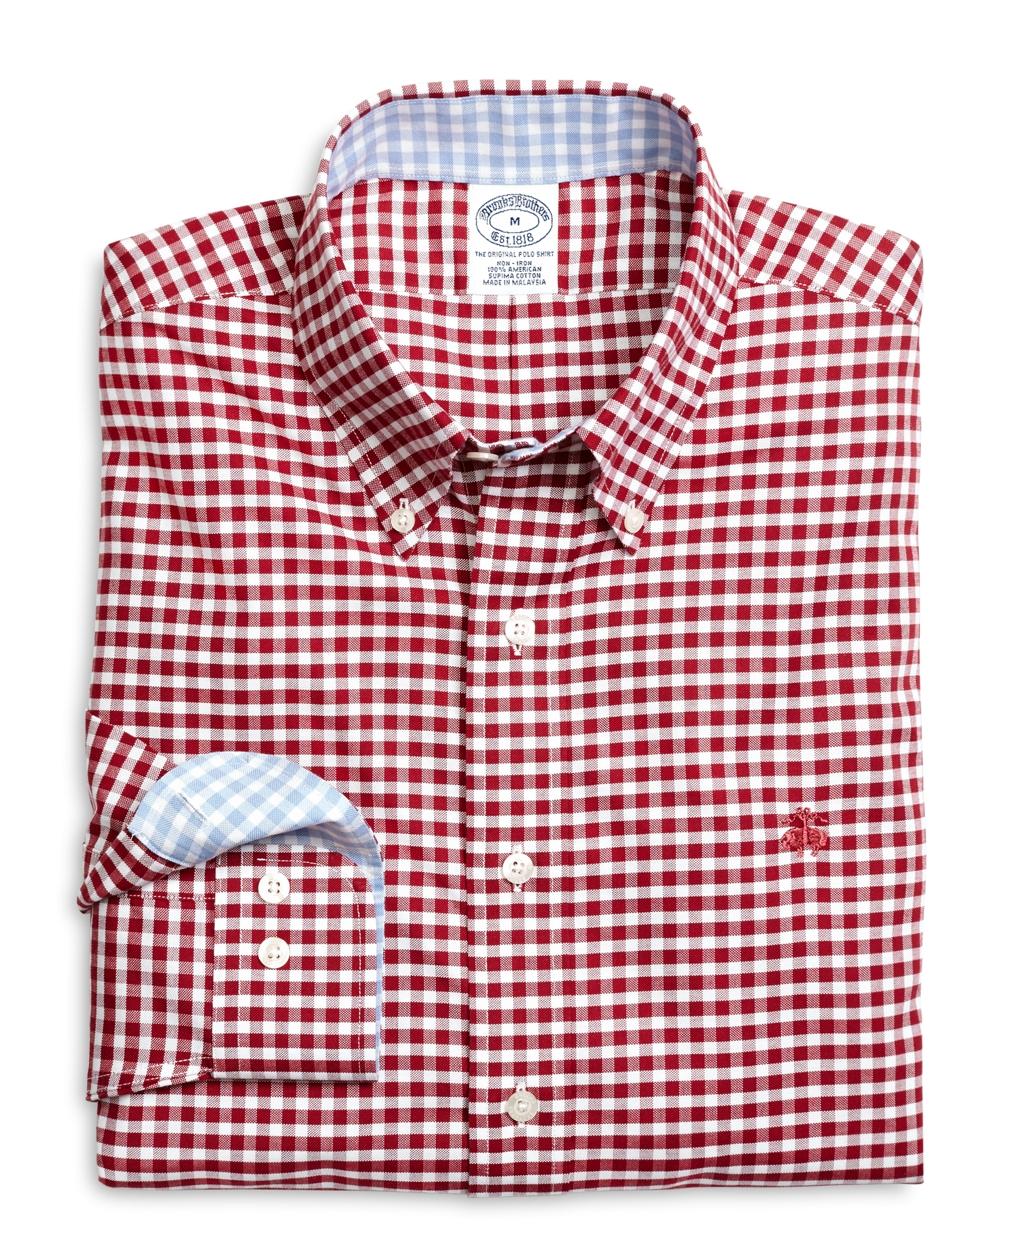 b0caec16d756 Lyst - Brooks Brothers Supima® Cotton Non-iron Slim Fit Oxford ...